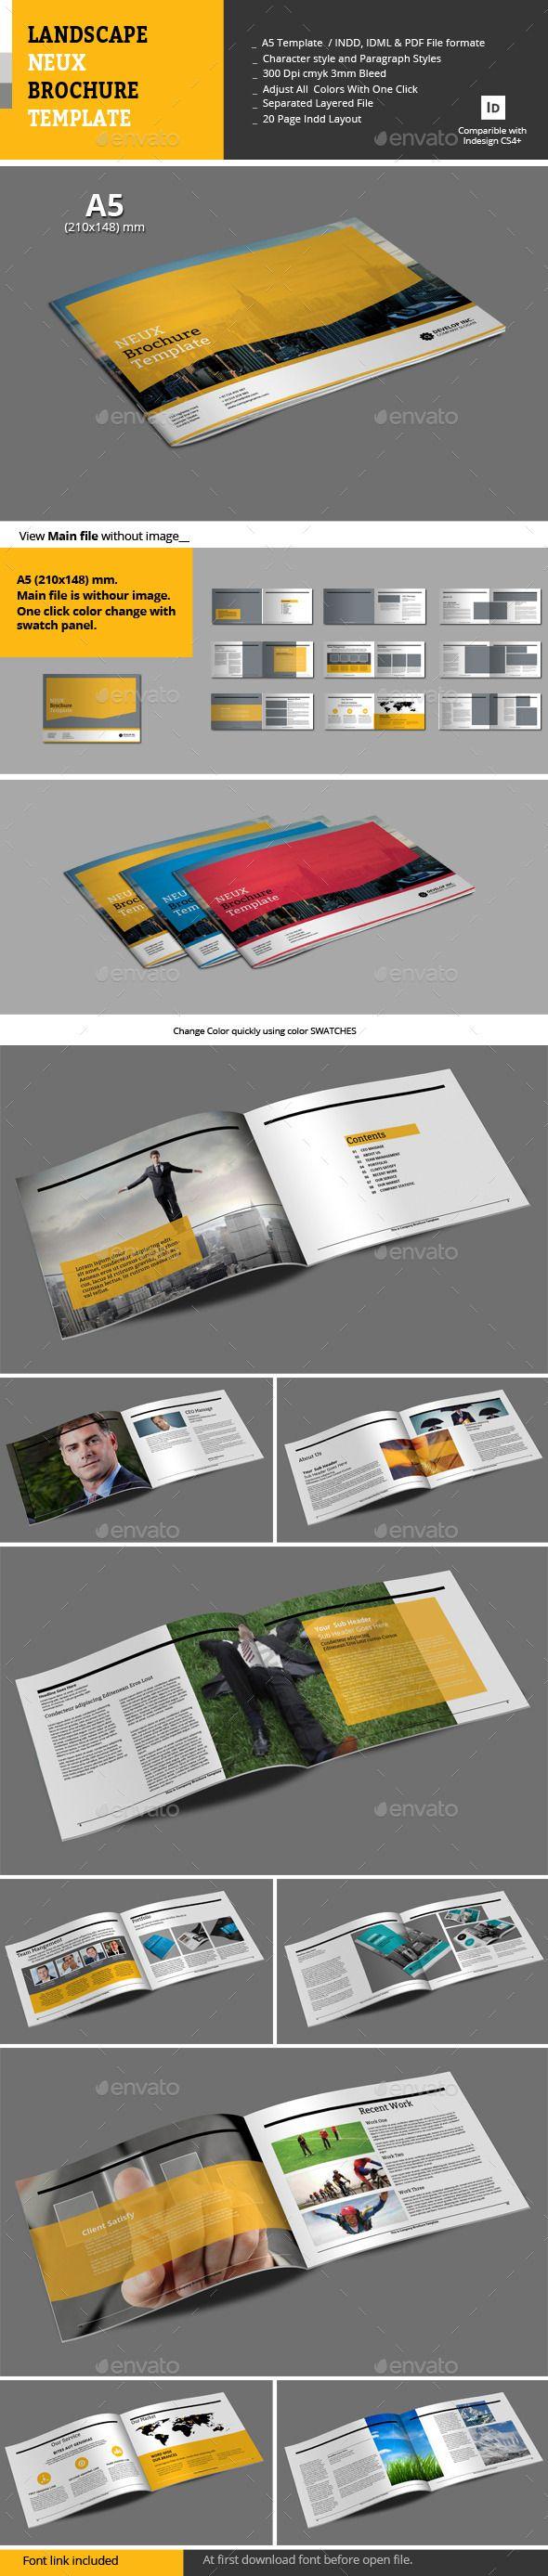 Landscape Neux Brochure Template | Brochure template, Brochures and ...